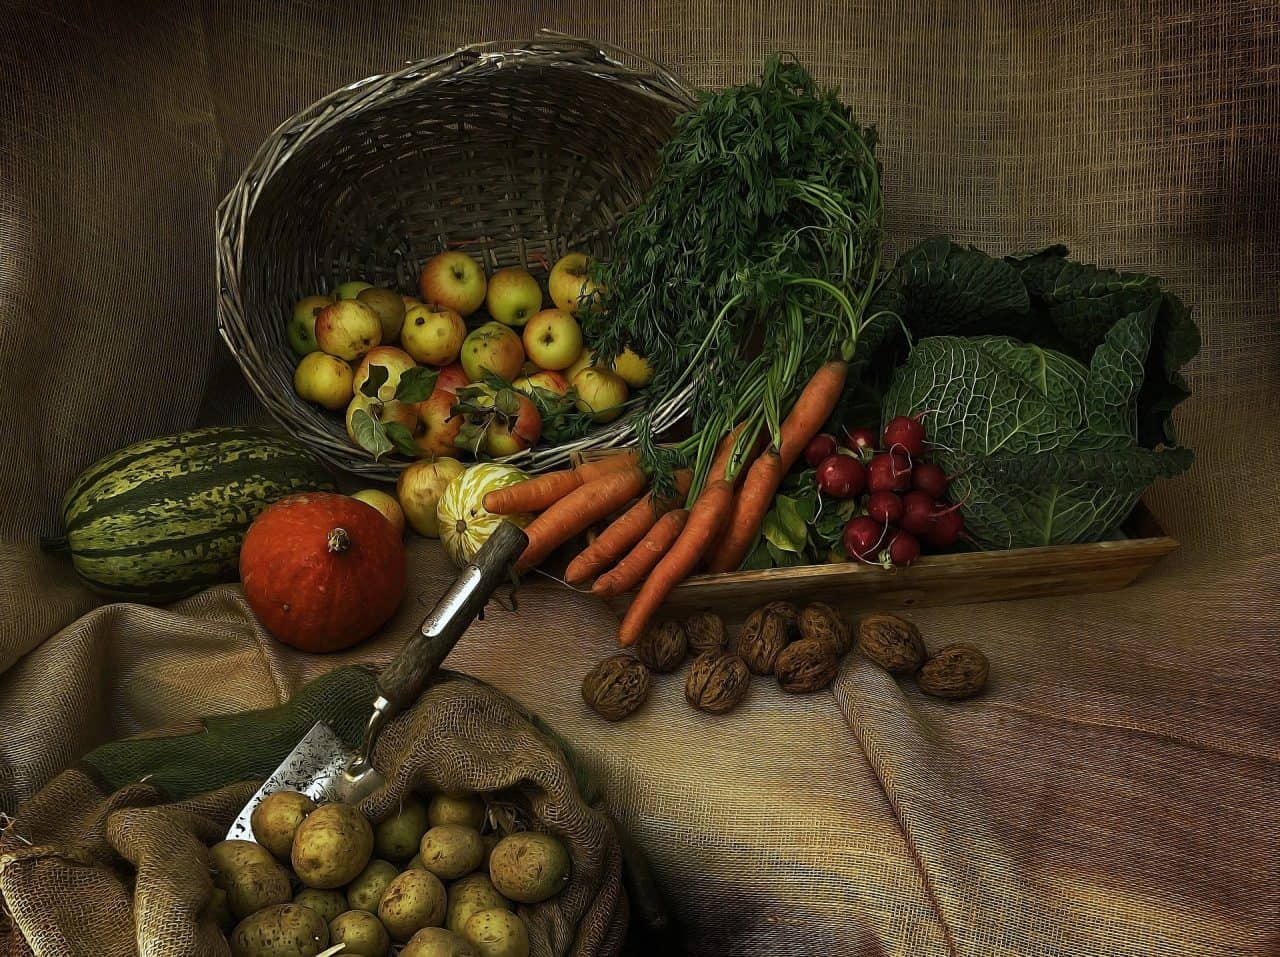 Dieta a base vegetale: è vantaggiosa?